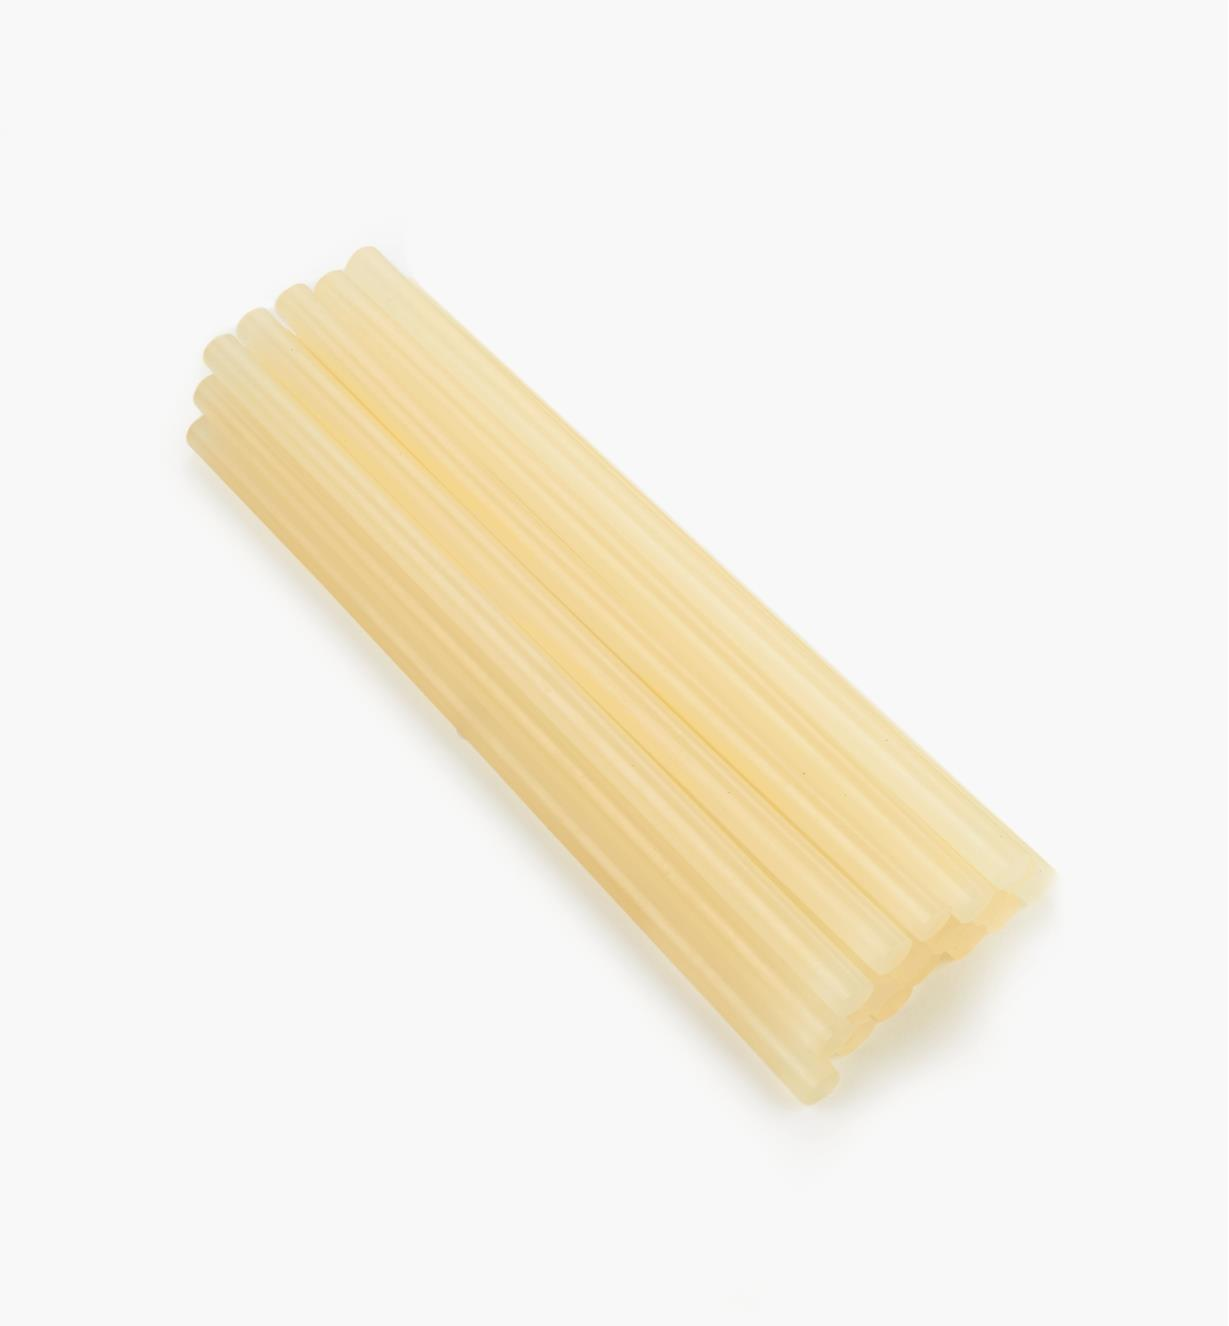 03K0355 - Flex 180 Adhesive Sticks, pkg of 18